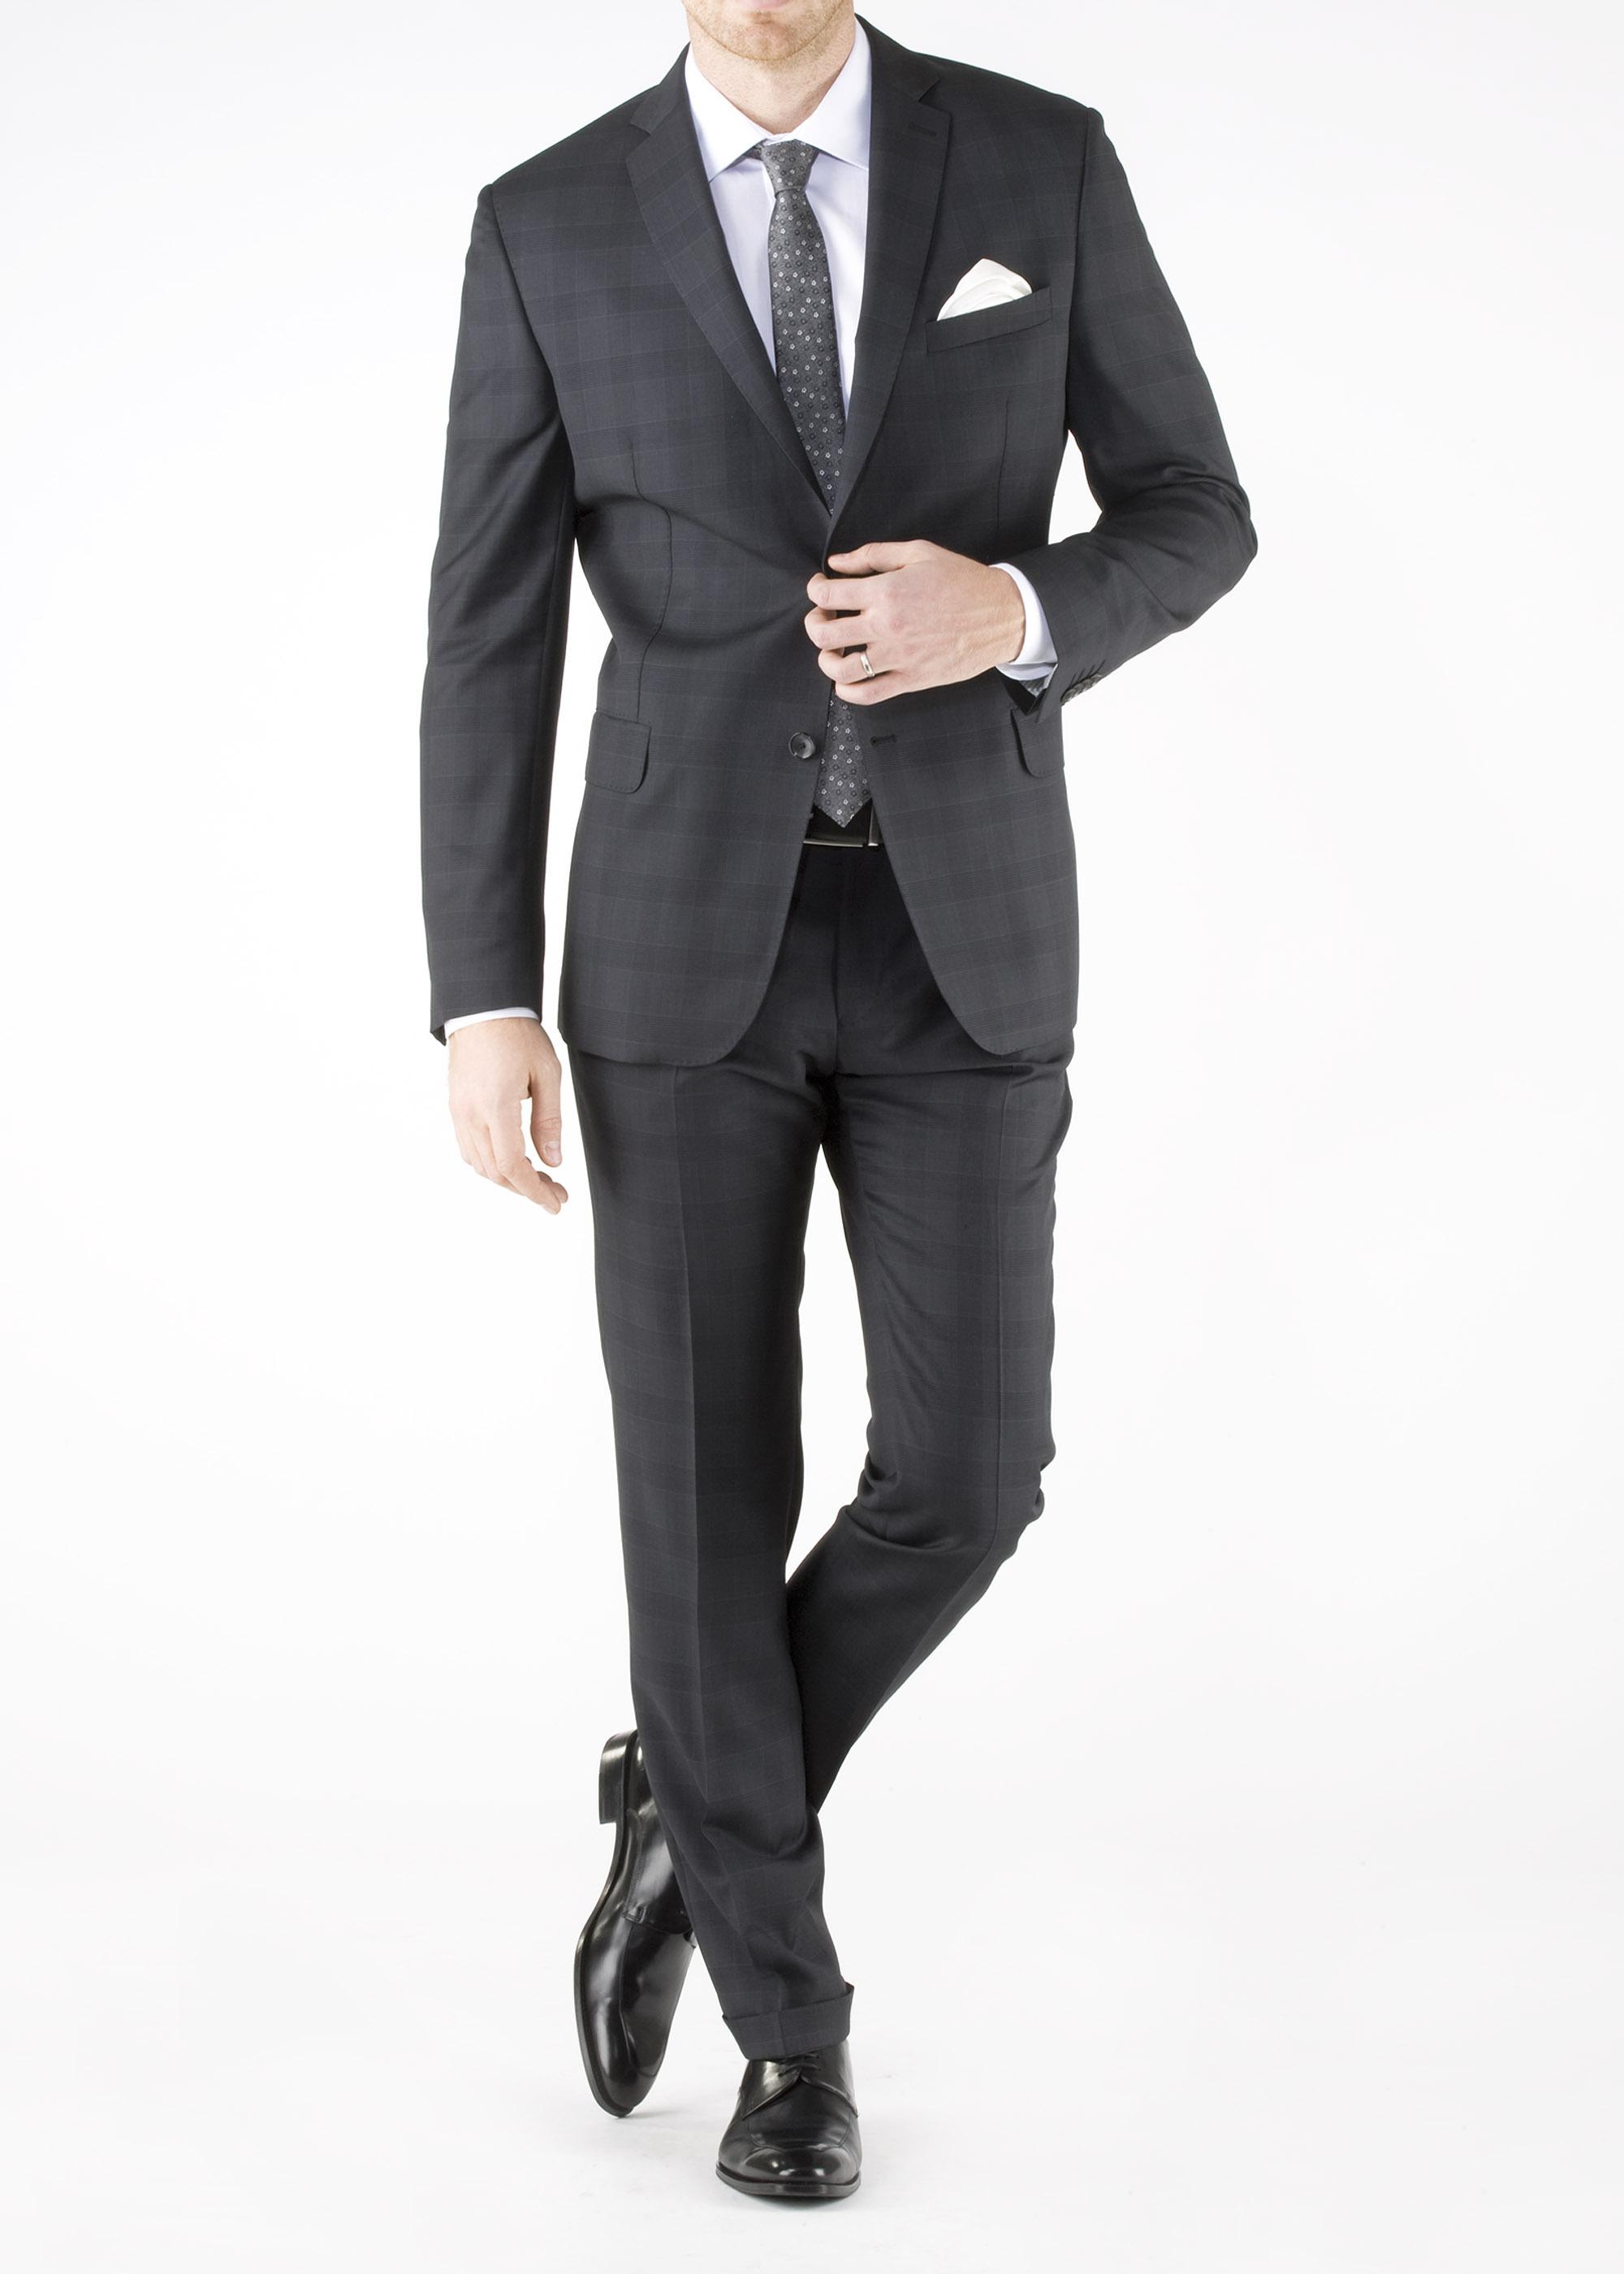 b86b5b31e69f Jak nosit sako a oblek. 10 jednoduchých základů - Milan Polák